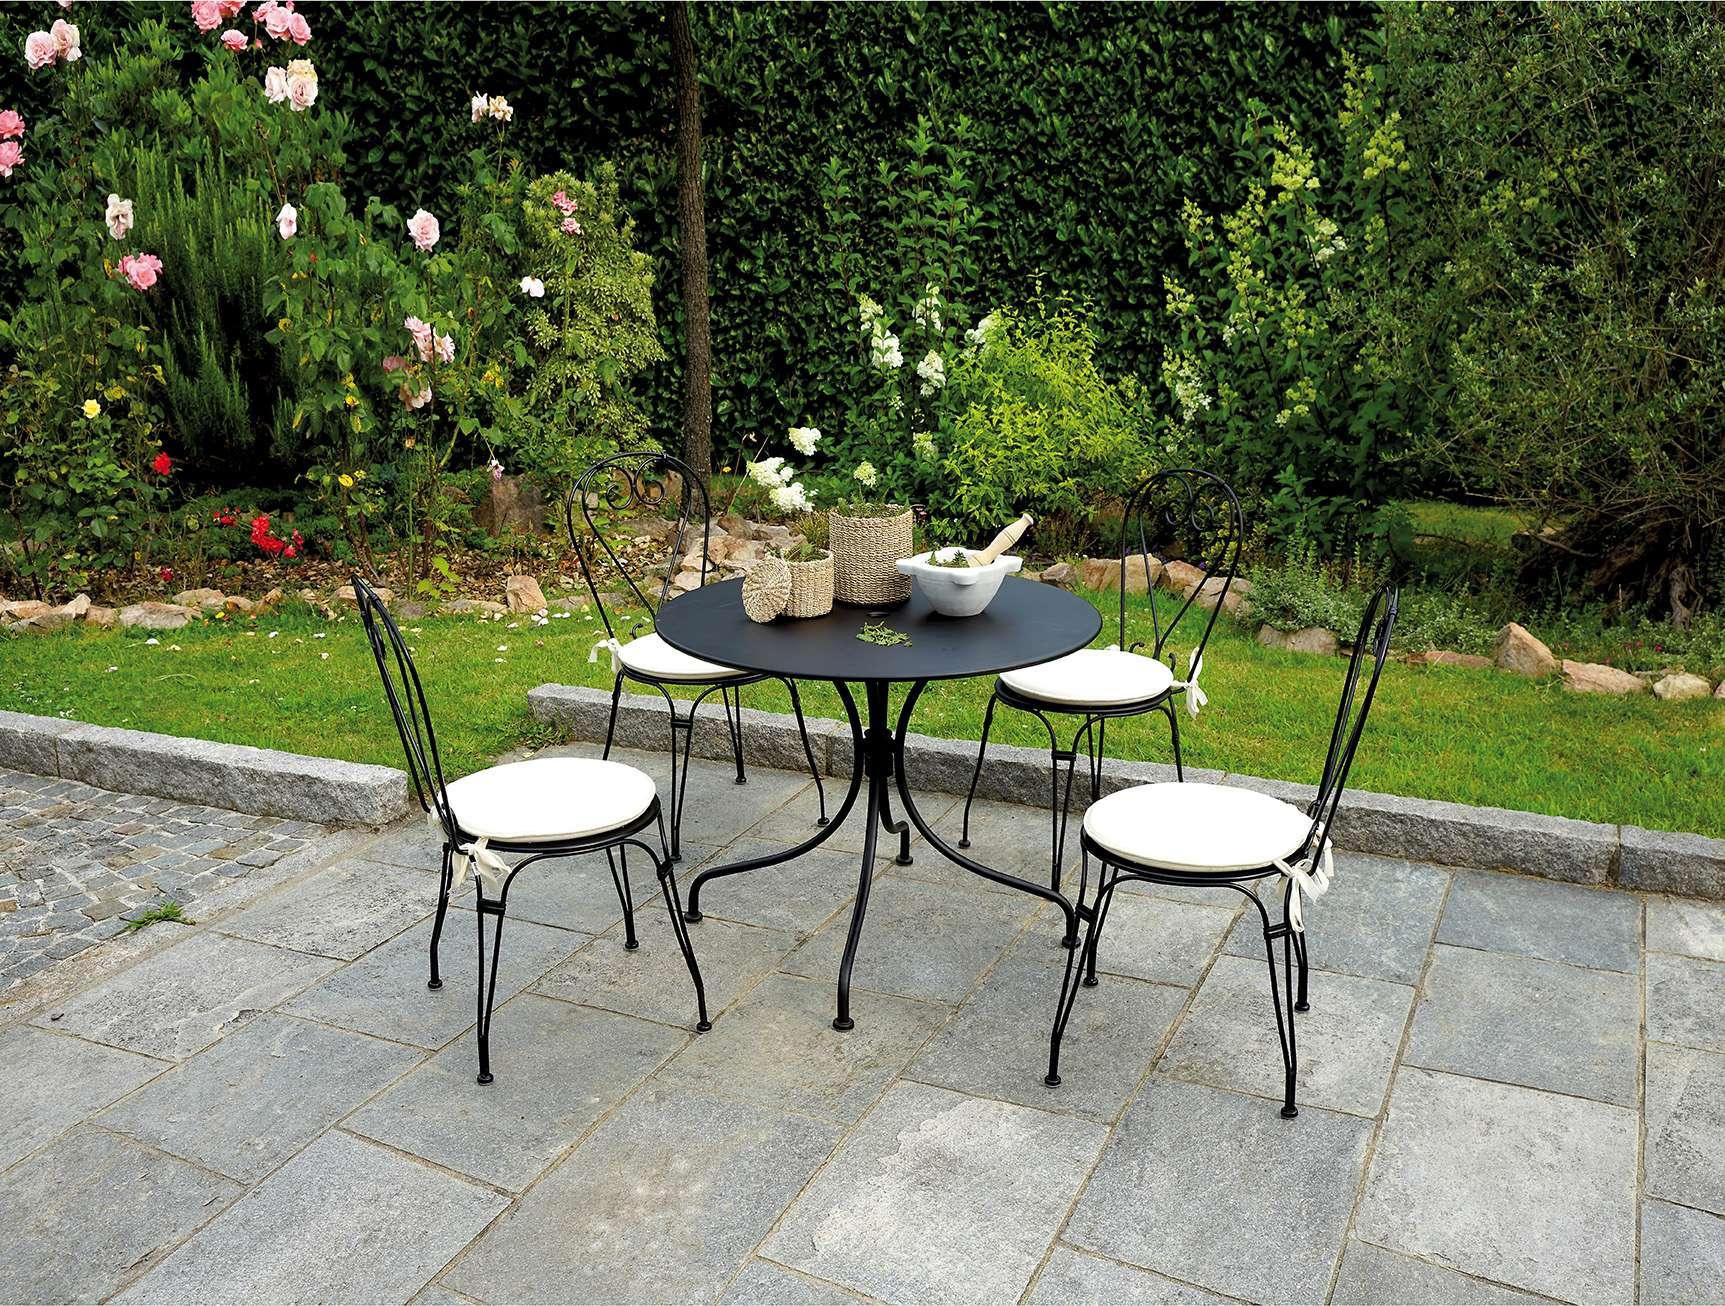 Ambientazione ttf52 chf03 greenwood mobili da giardino - Mobili da giardino in teak ...